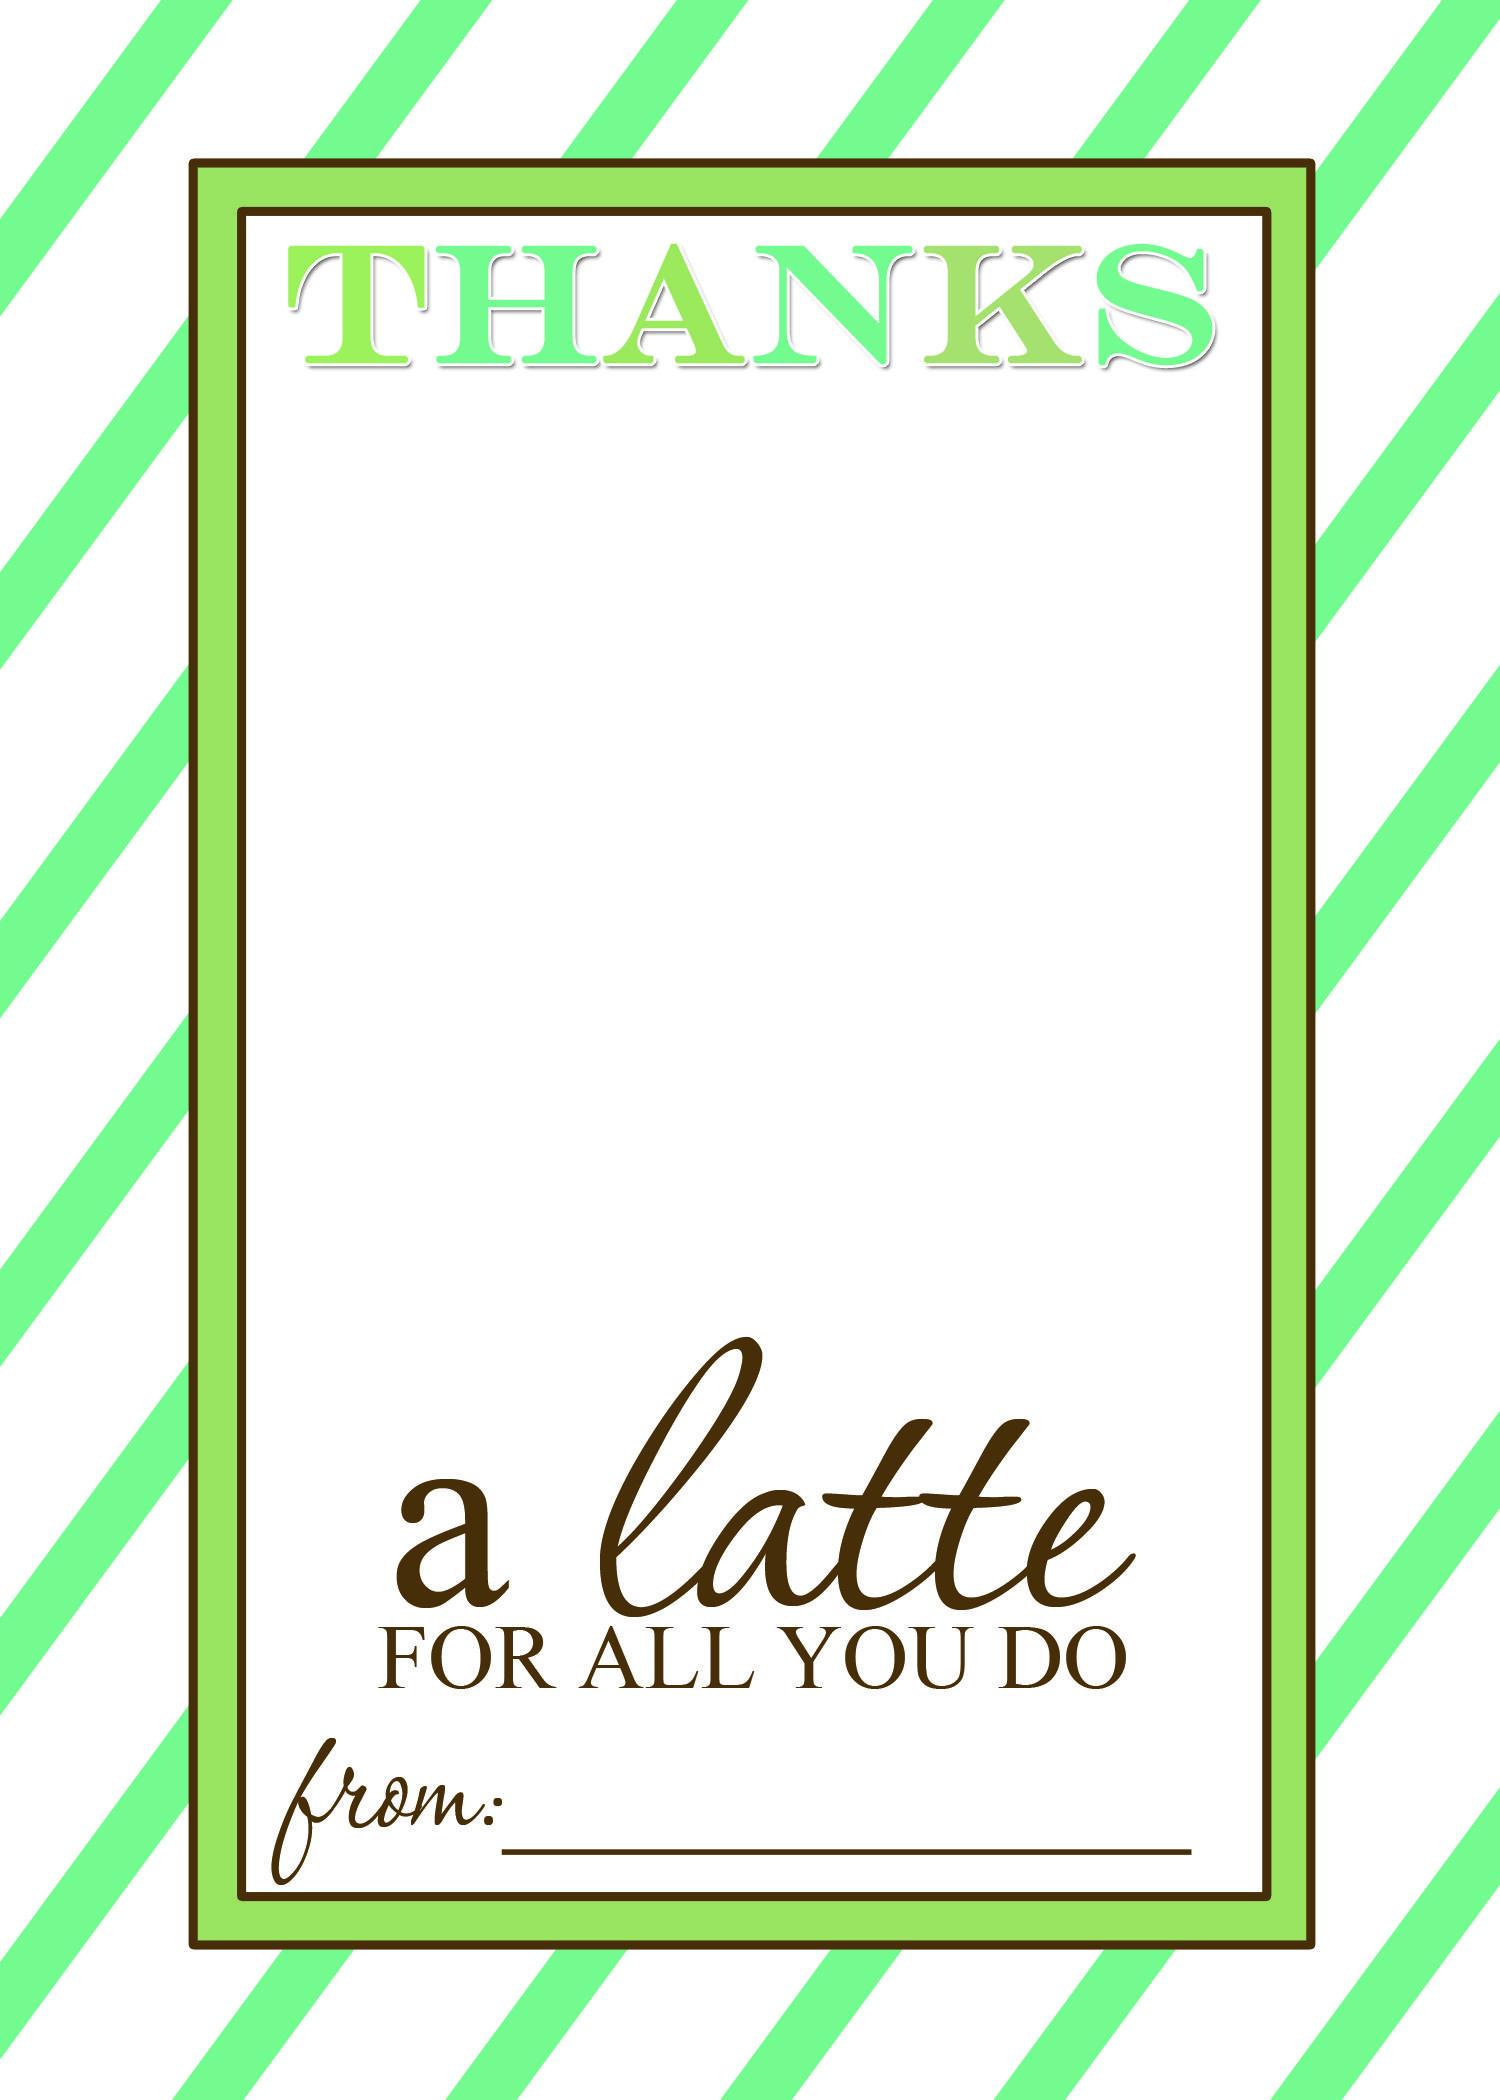 Thanks A Latte Free Printable Gift Card Holder Teacher Gift | Craft - Thanks A Latte Free Printable